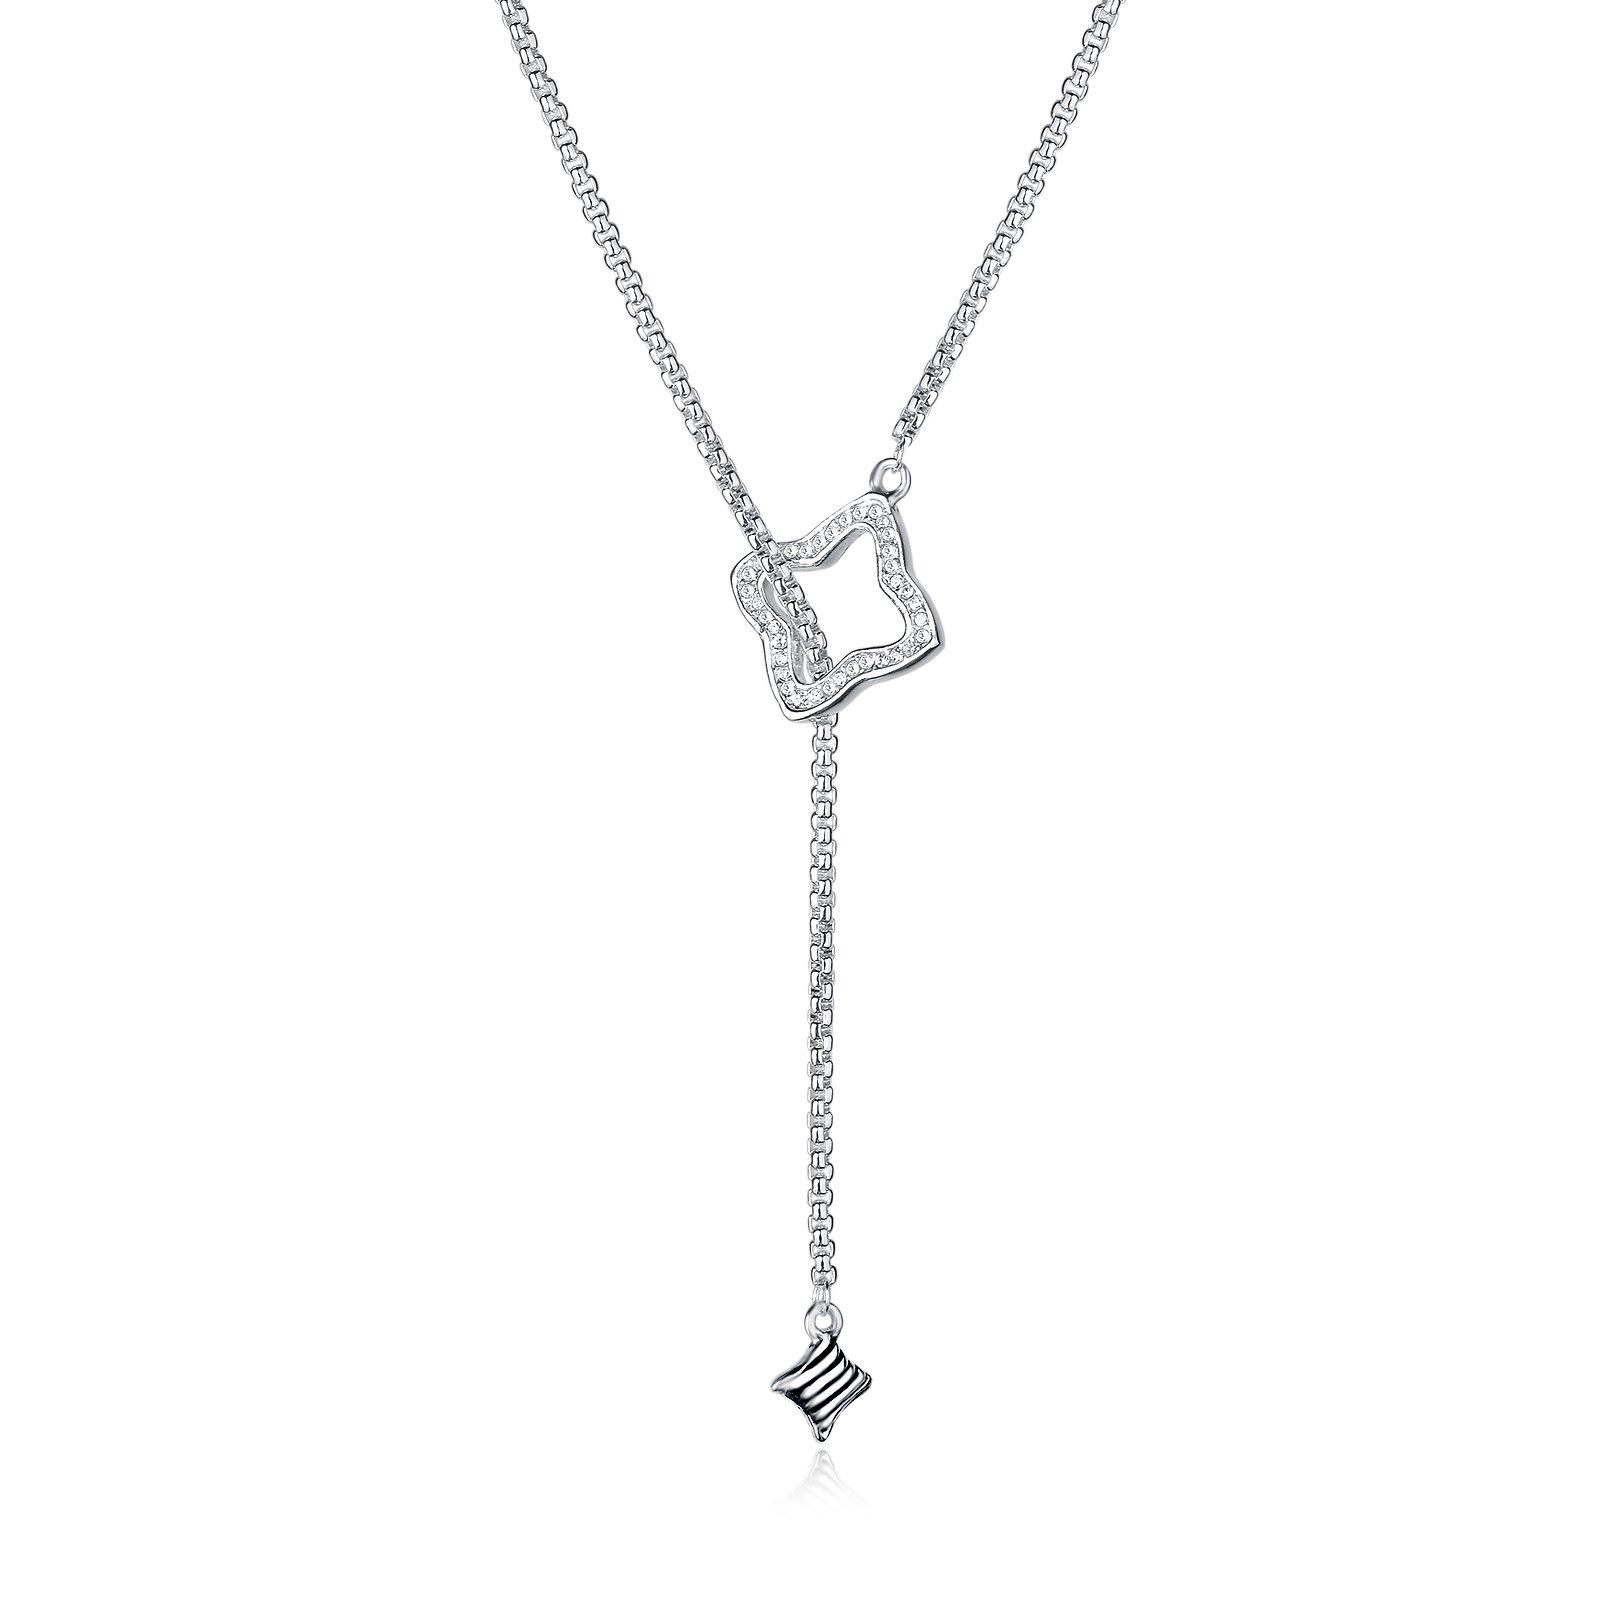 UNY New Style Trendy Elegant Vintage Retro Unique Pave Stone David Fahsion style Box Chain Women Long Necklace